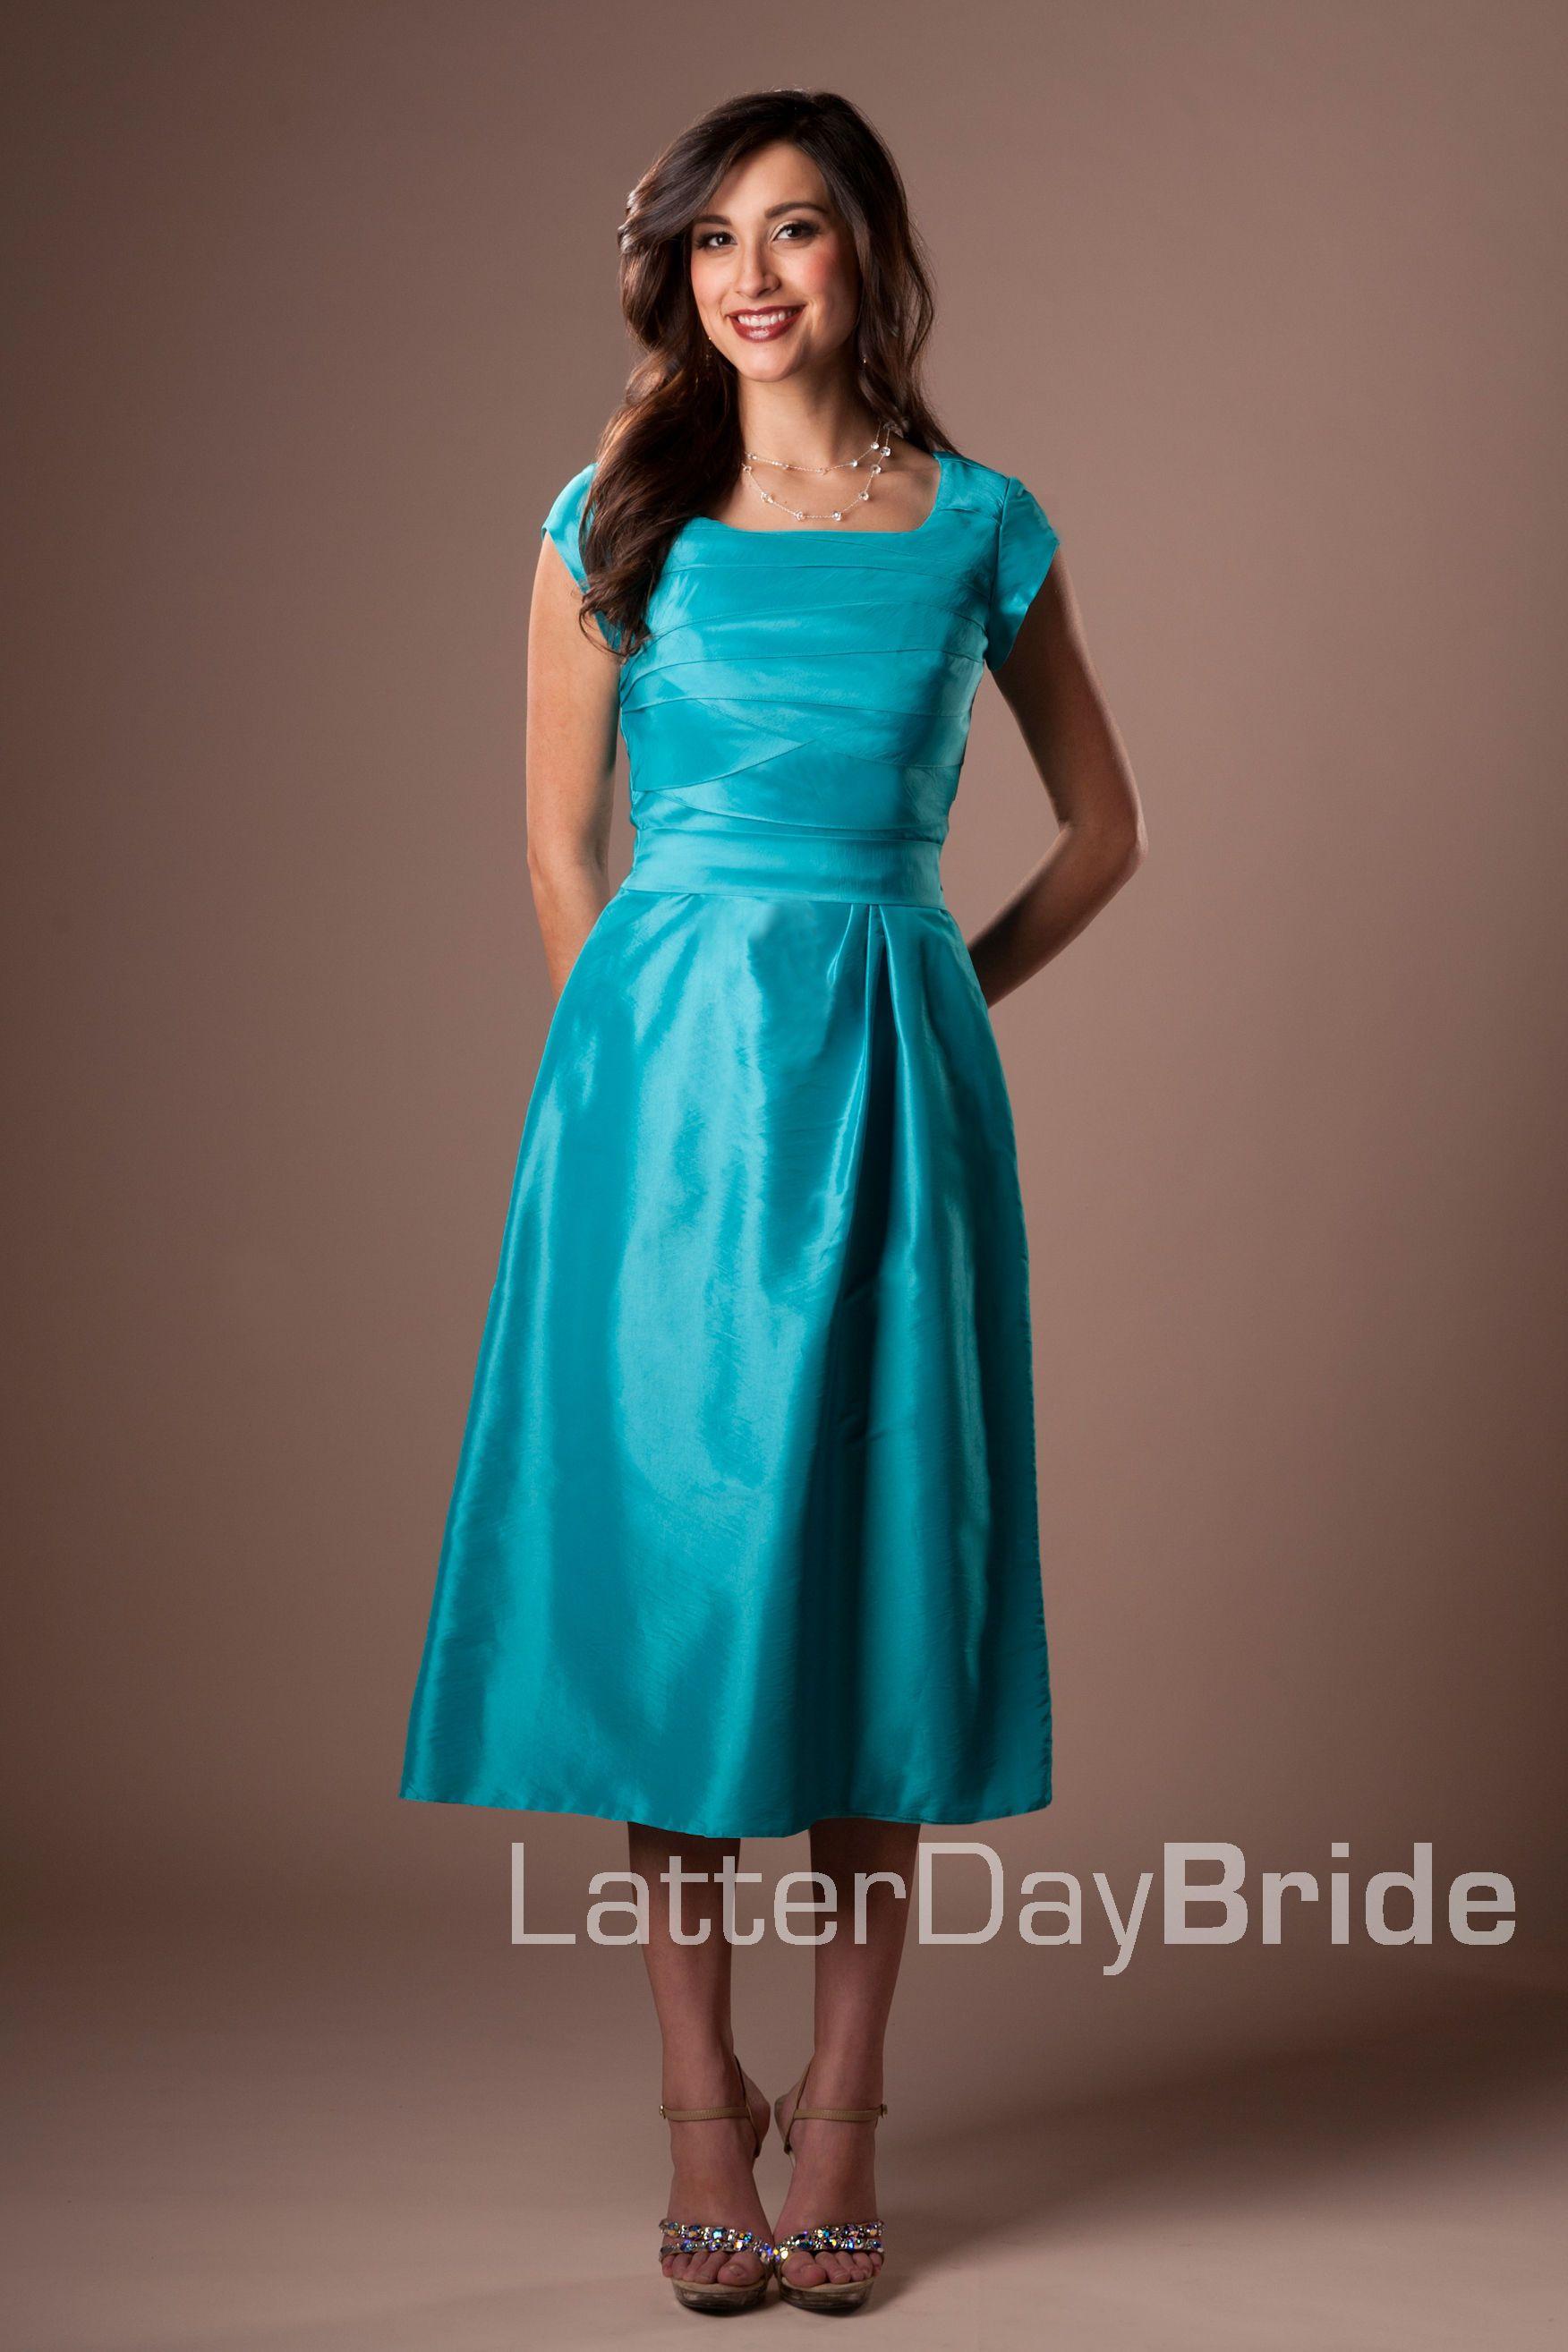 Bridesmaid & Prom, Faye   LatterDayBride & Prom   Weddings   Pinterest